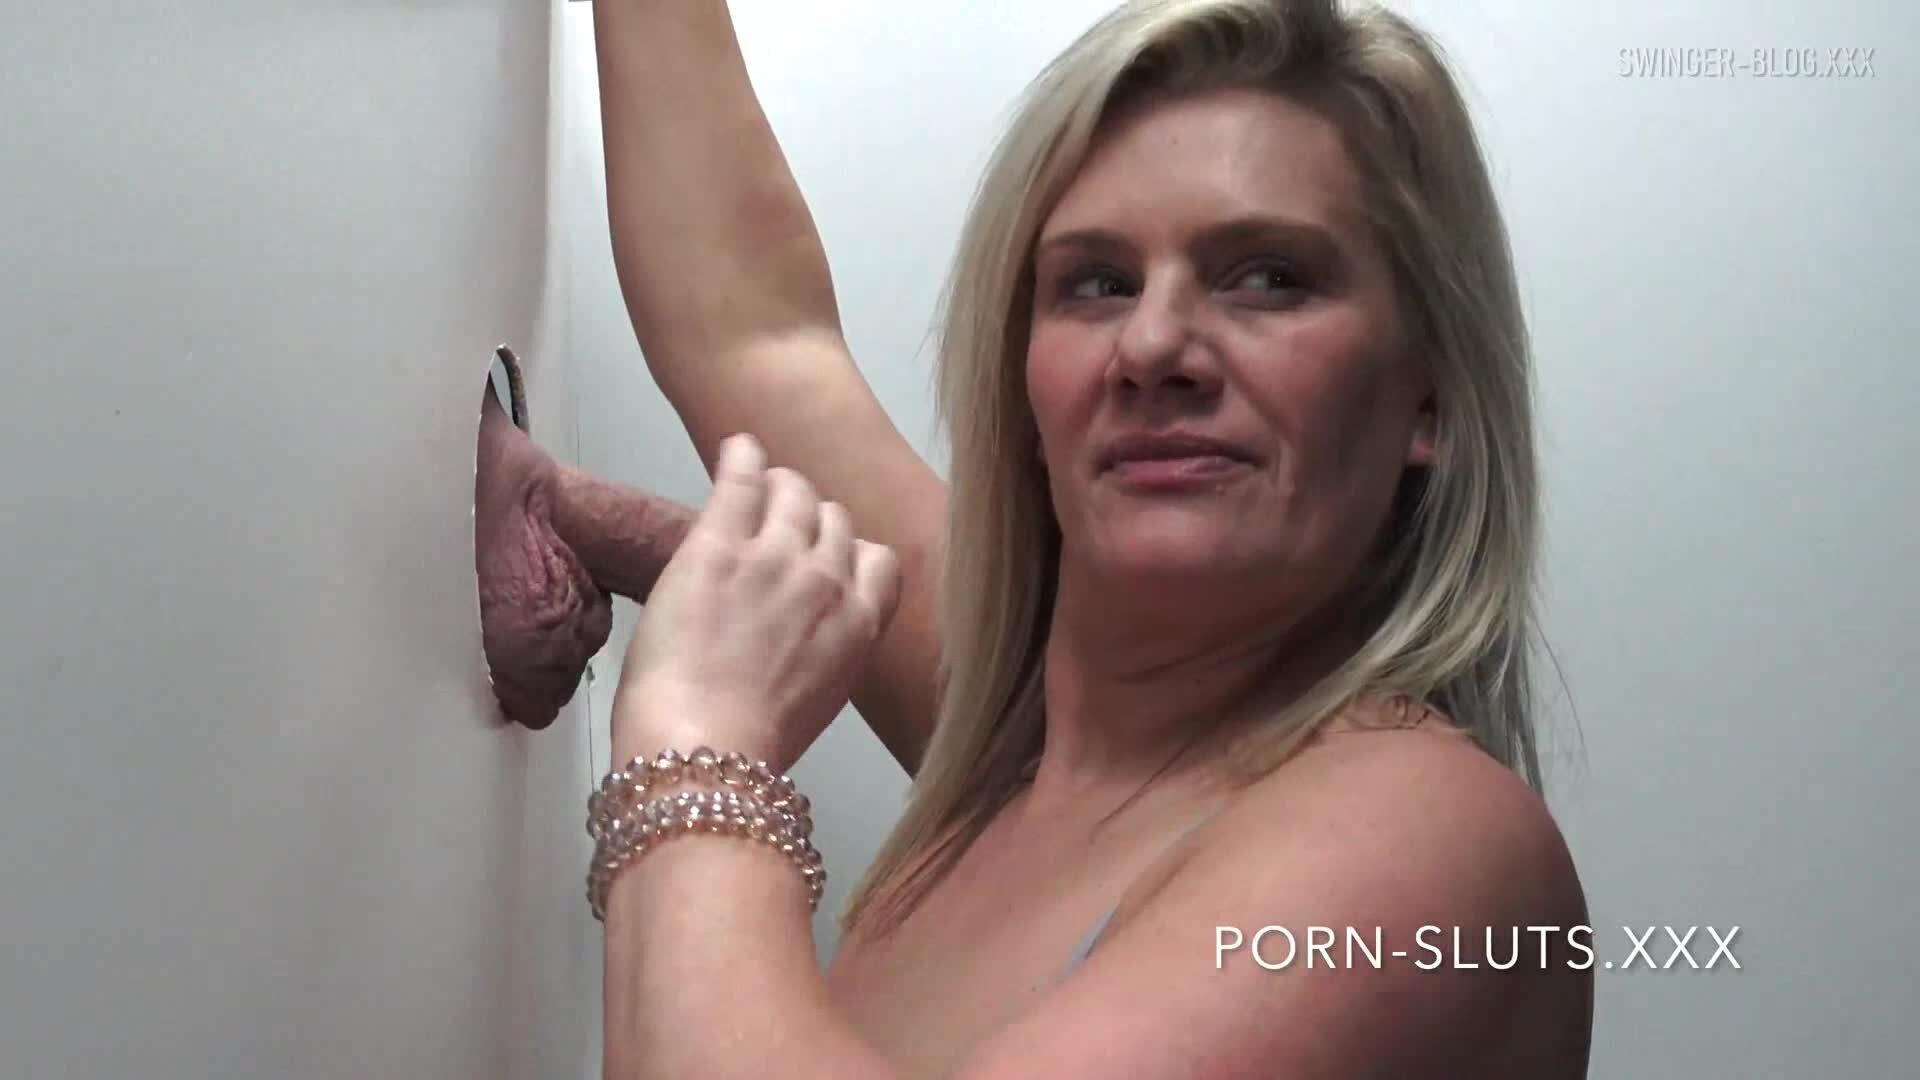 Sexy girlfriend nude pics